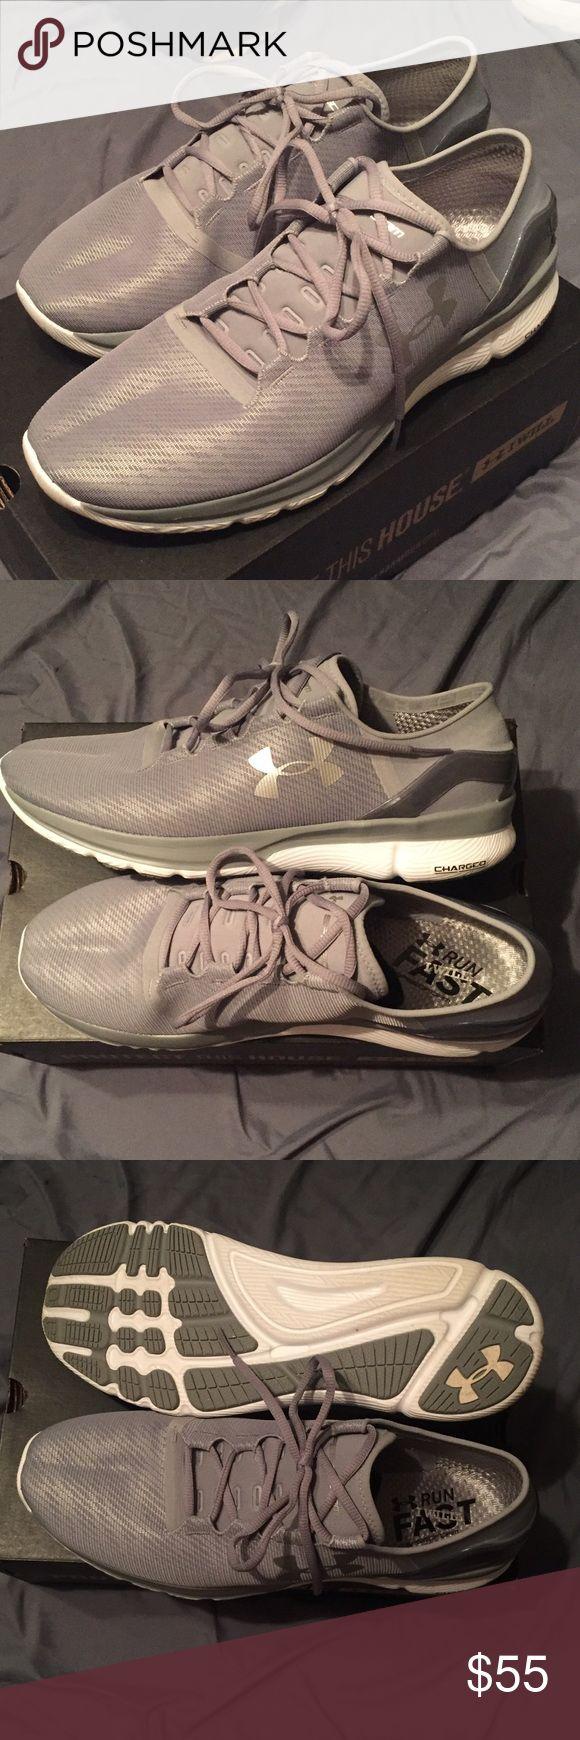 Men's UA Speedform Apollo 2 RF Size 13 Men's UA Speedform Apollo 2 RF Size 13. Reflective. Excellent condition. Worn once. Still have box. Under Armour Shoes Athletic Shoes